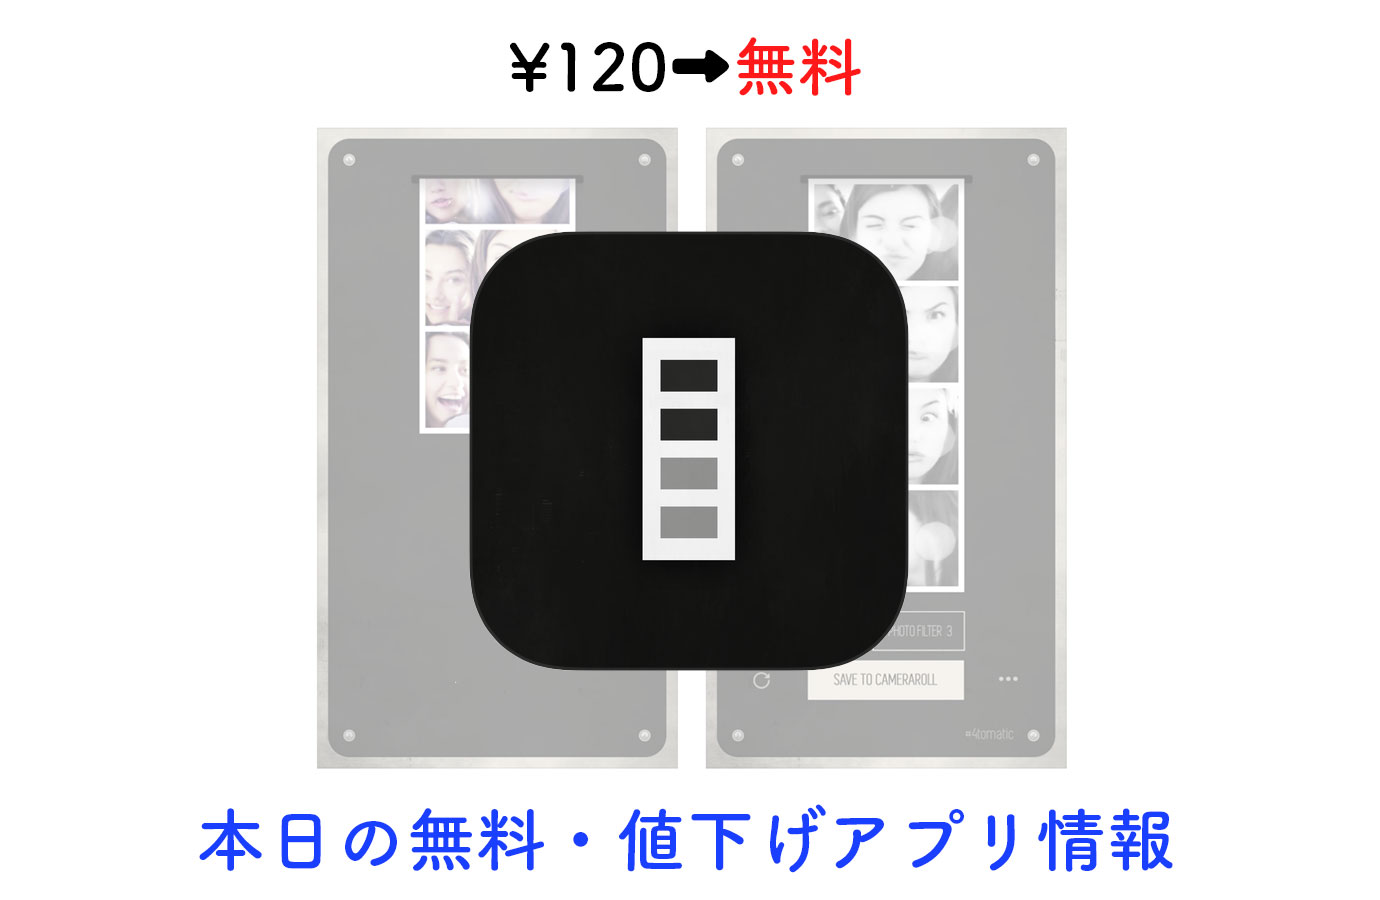 Appsale1001